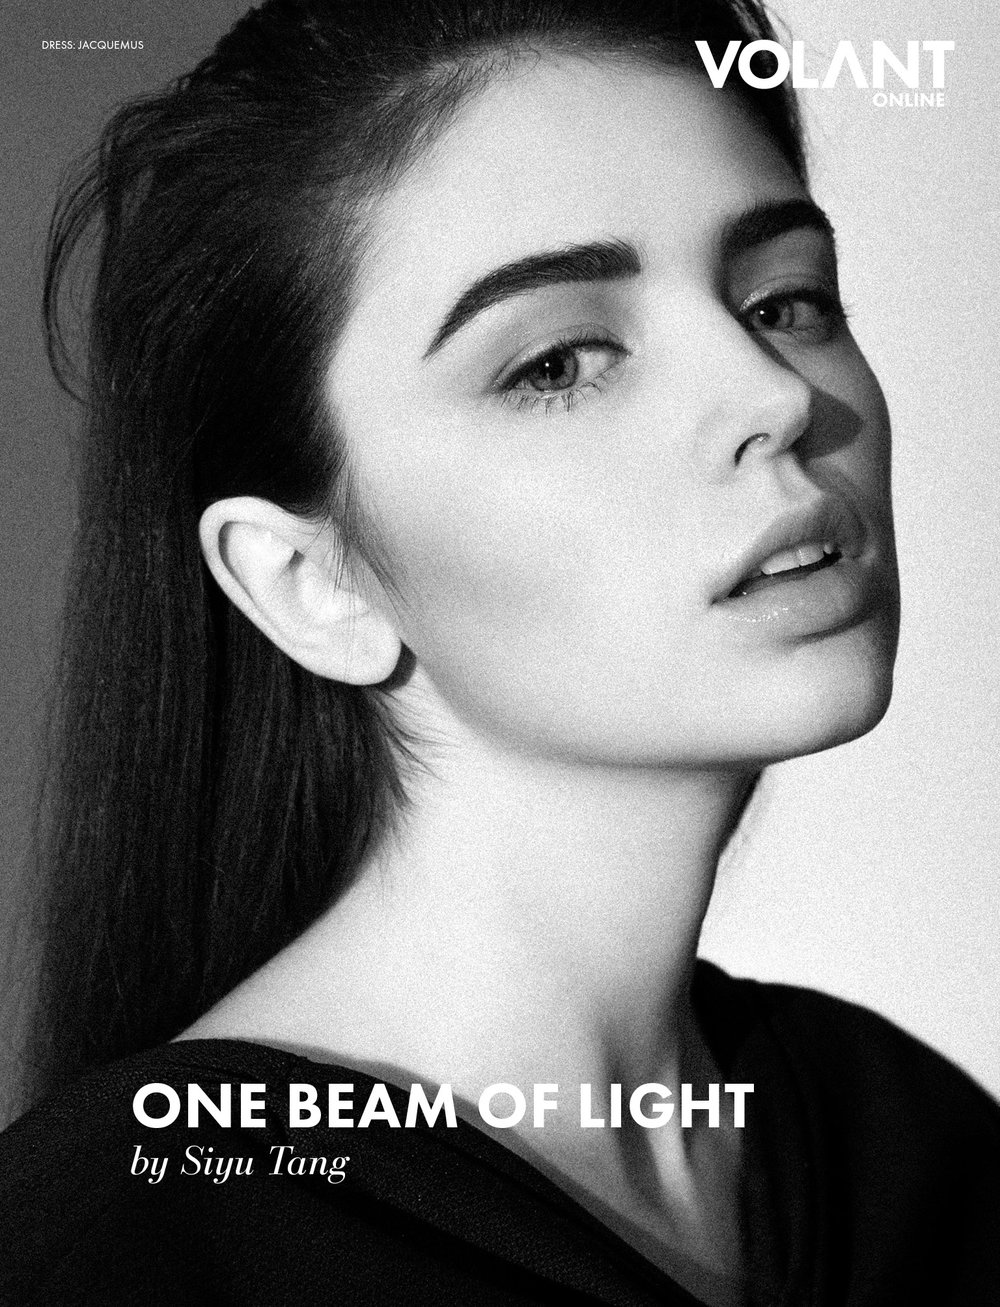 volant-webitorial-onebeamoflight.jpg